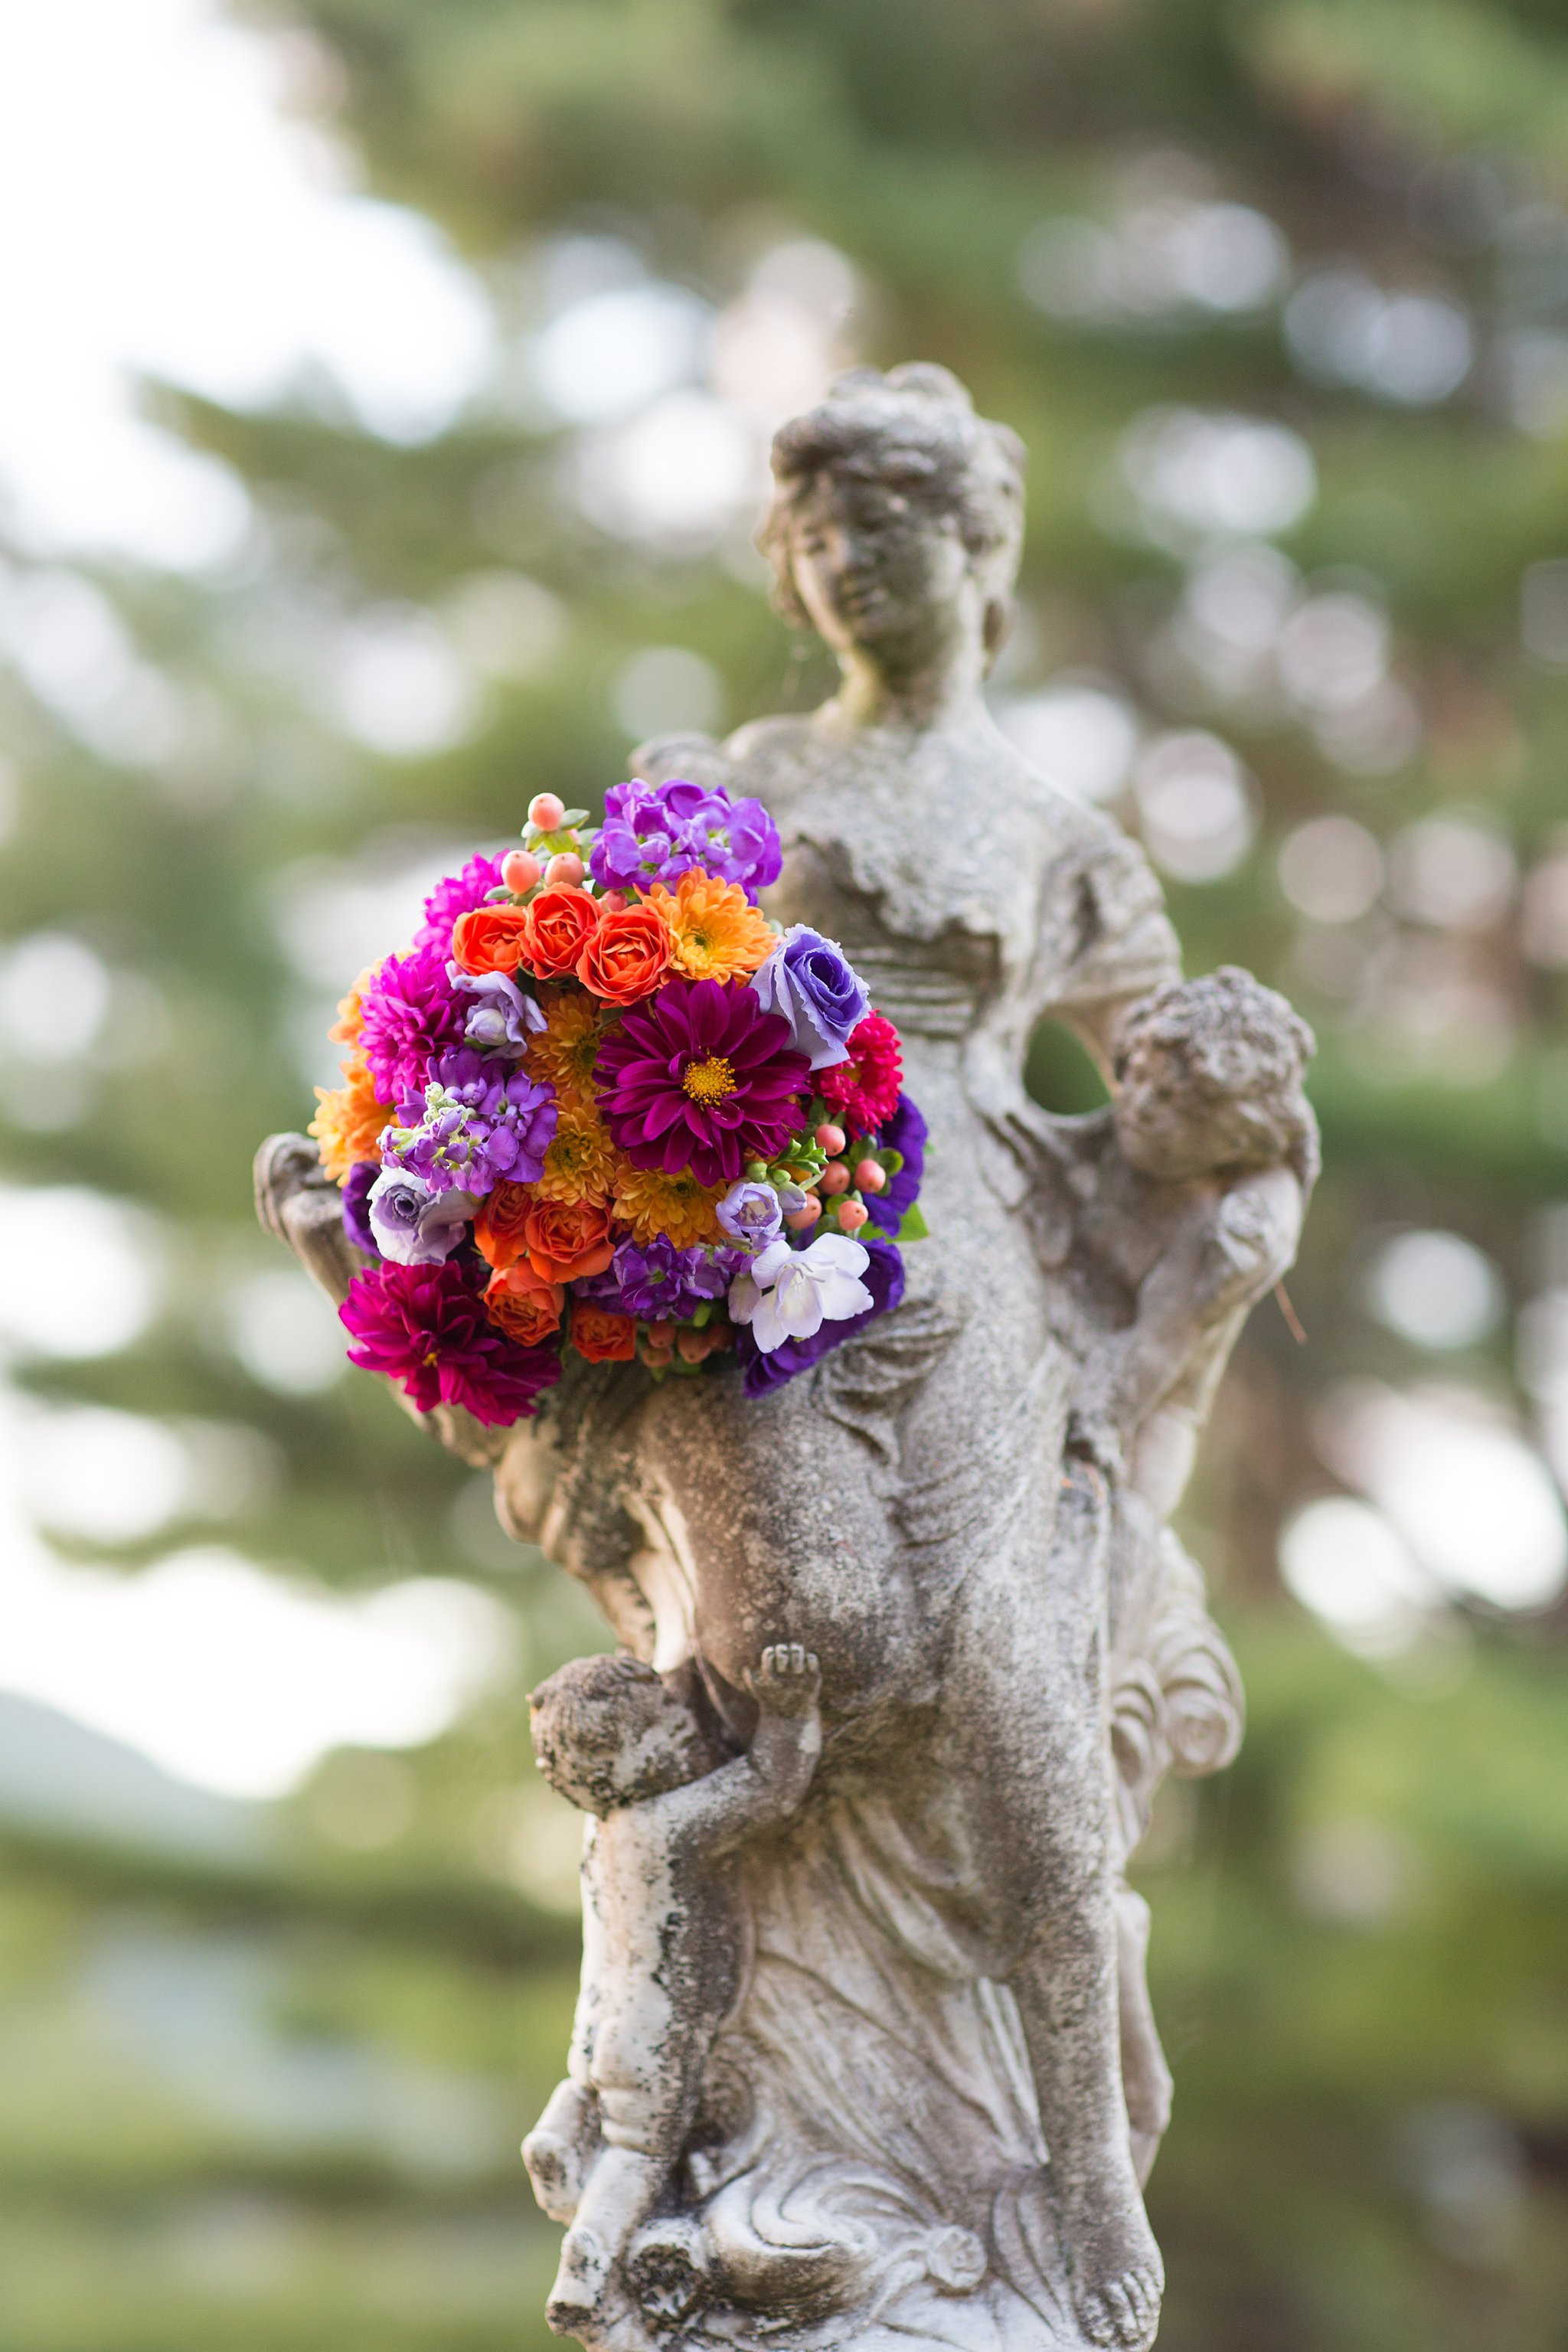 Bridal Bouquet and Garden Statue